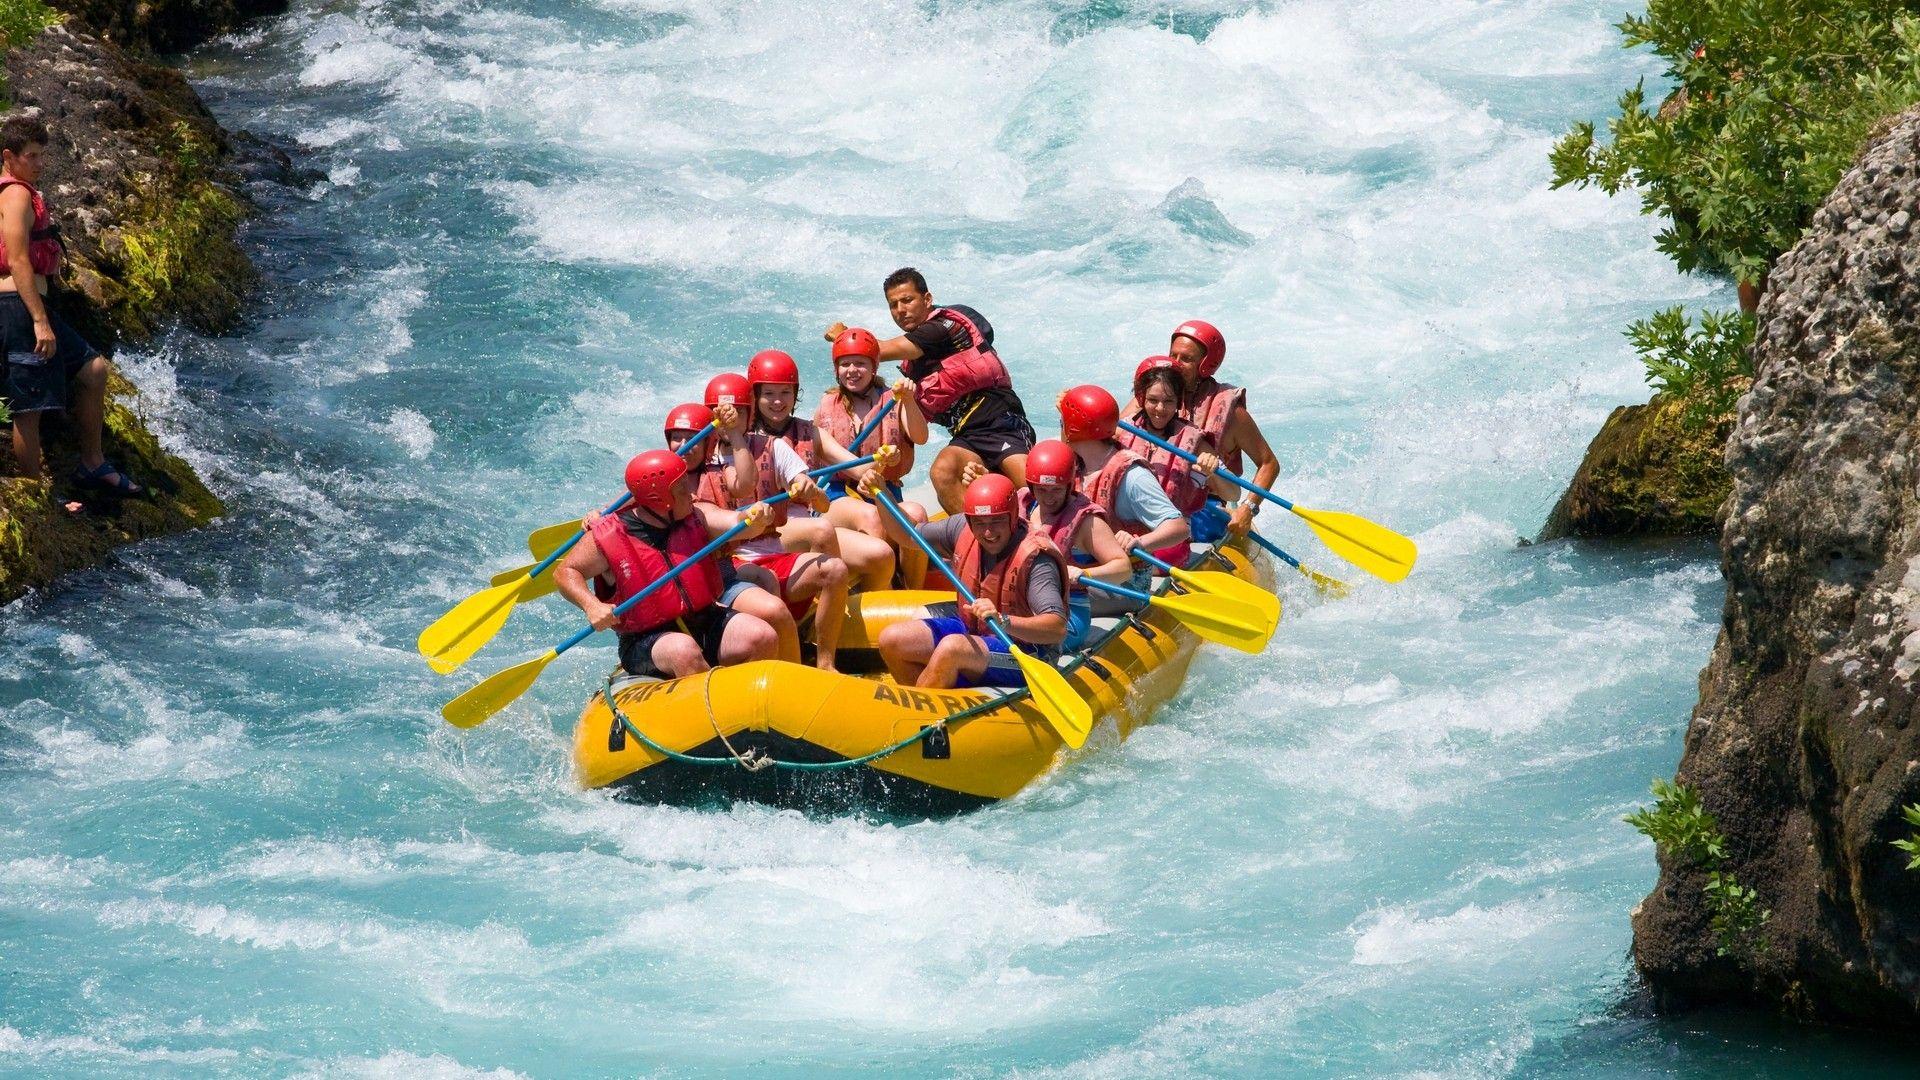 HD rafting wallpaper Rafting wallpaper Rafting Adventure 1920x1080